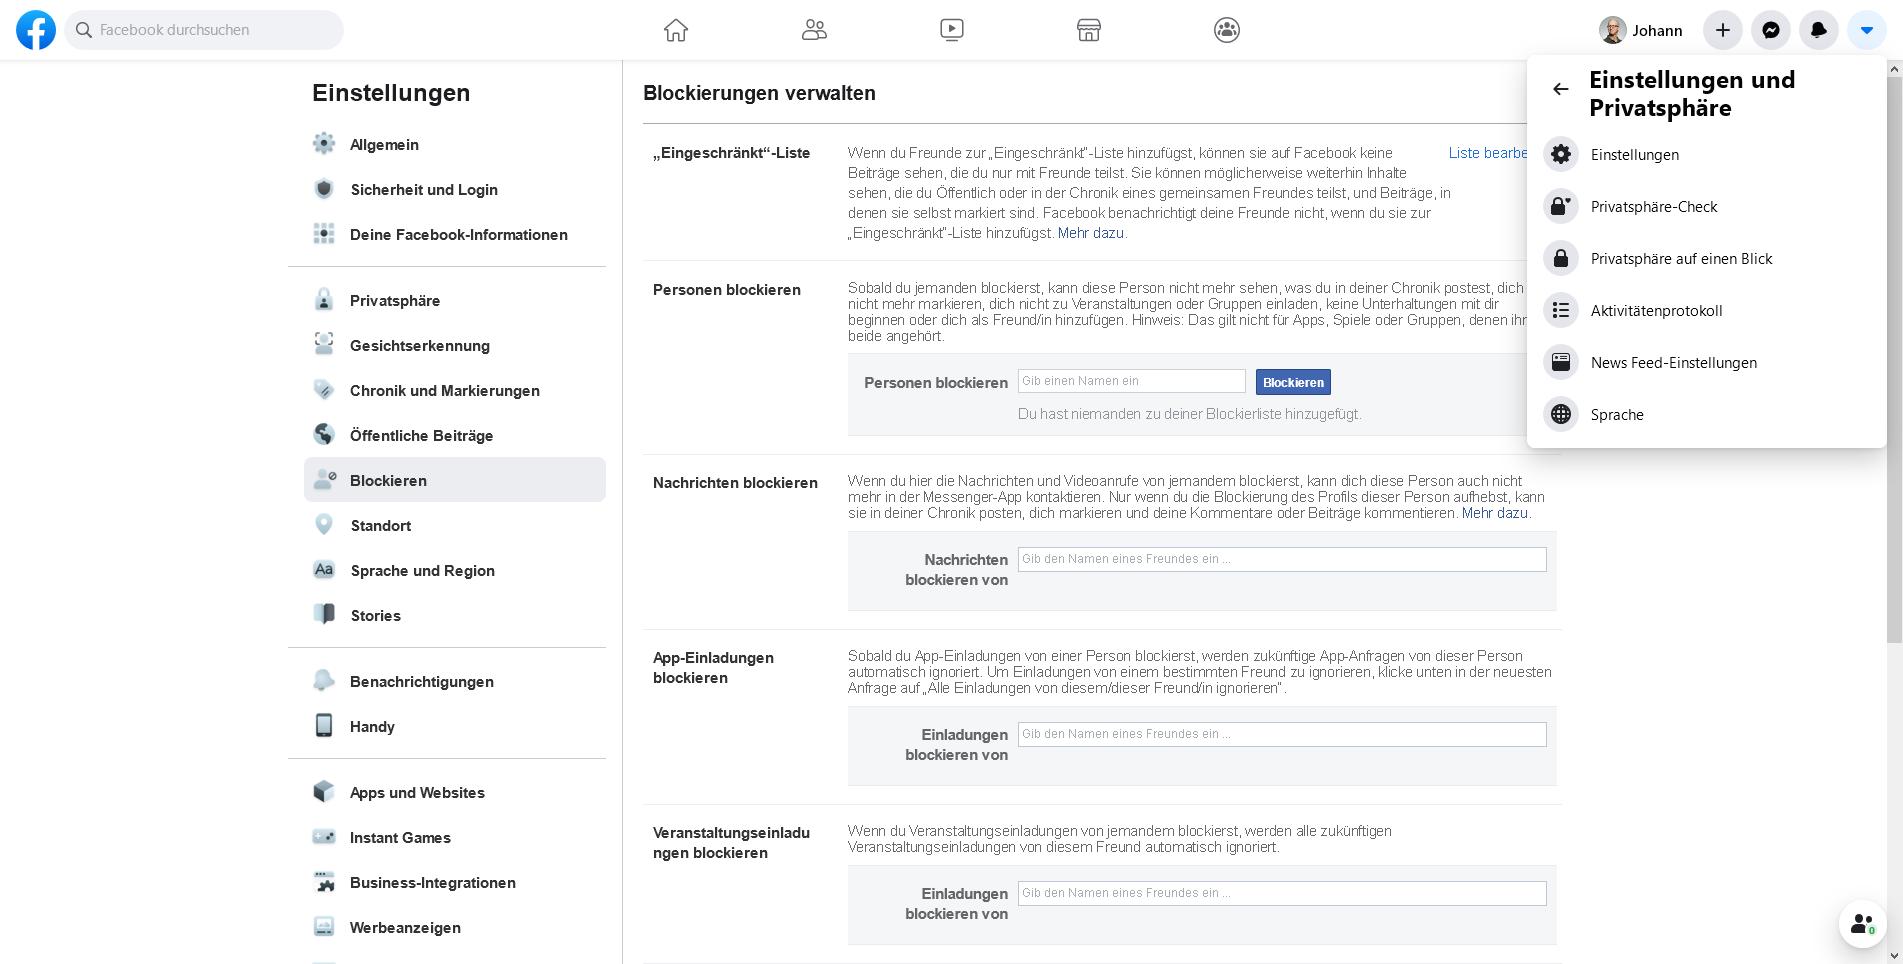 Facebook messenger nachrichten ignorieren rückgängig